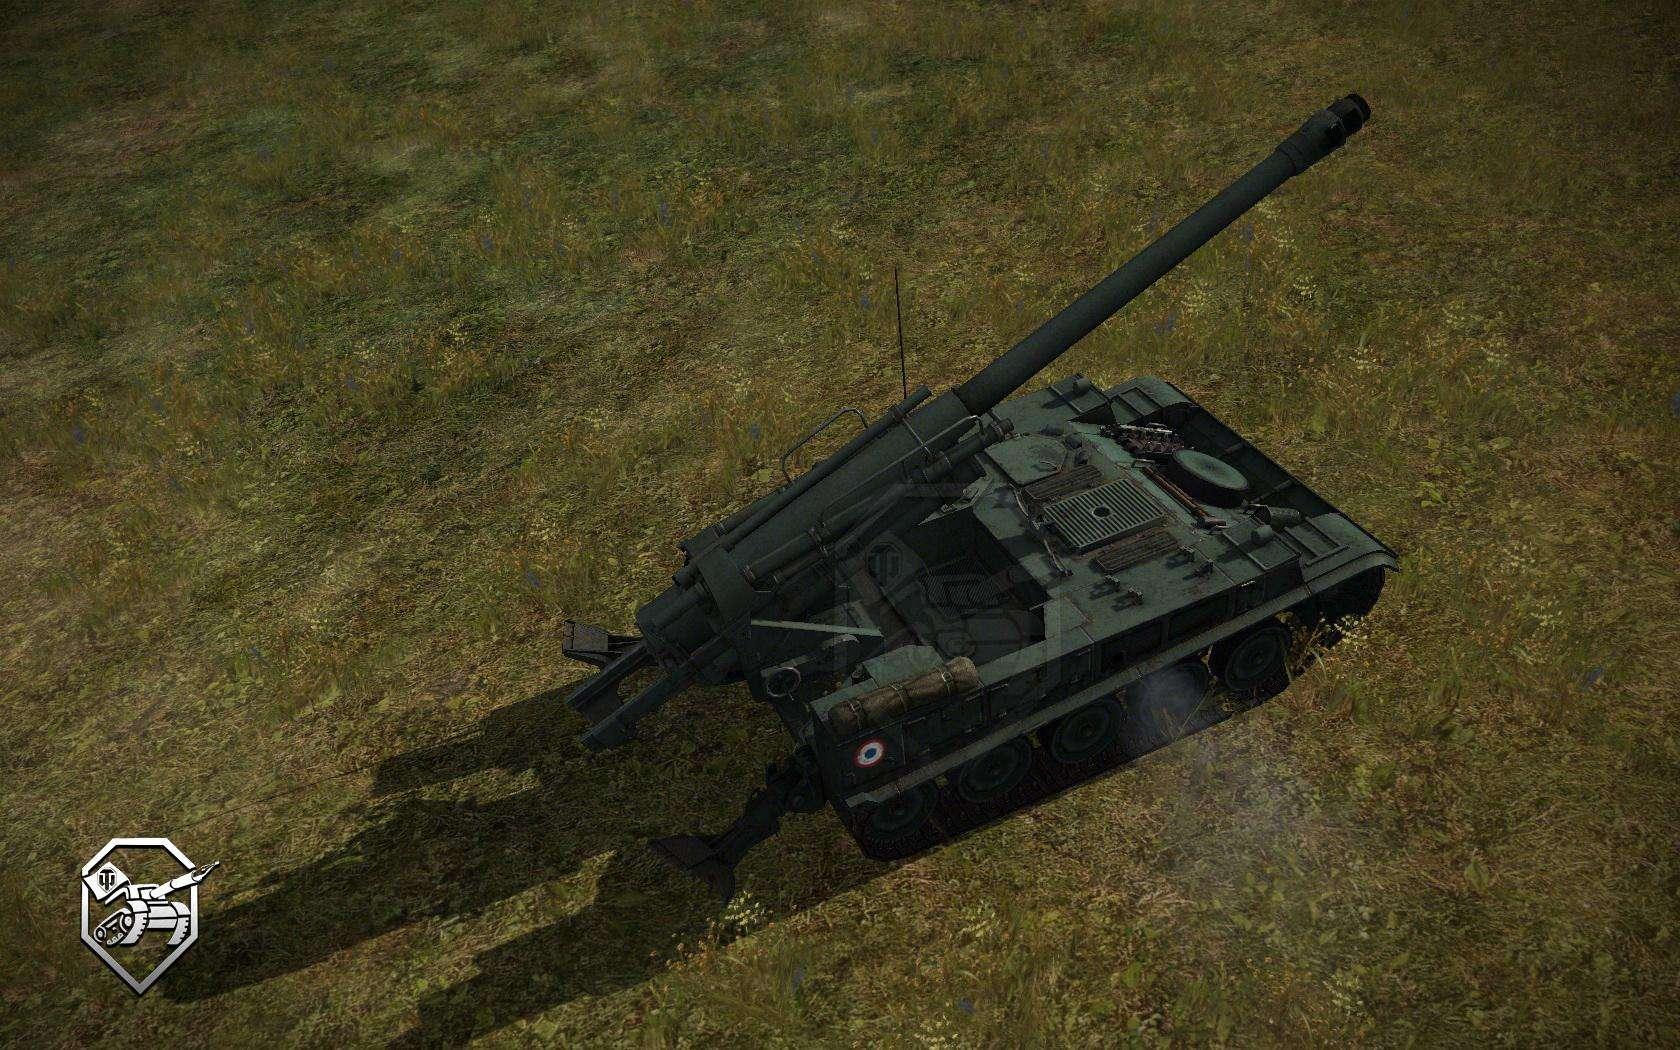 АМХ-13 F3 AM - АРТ САУ 5-го уровня